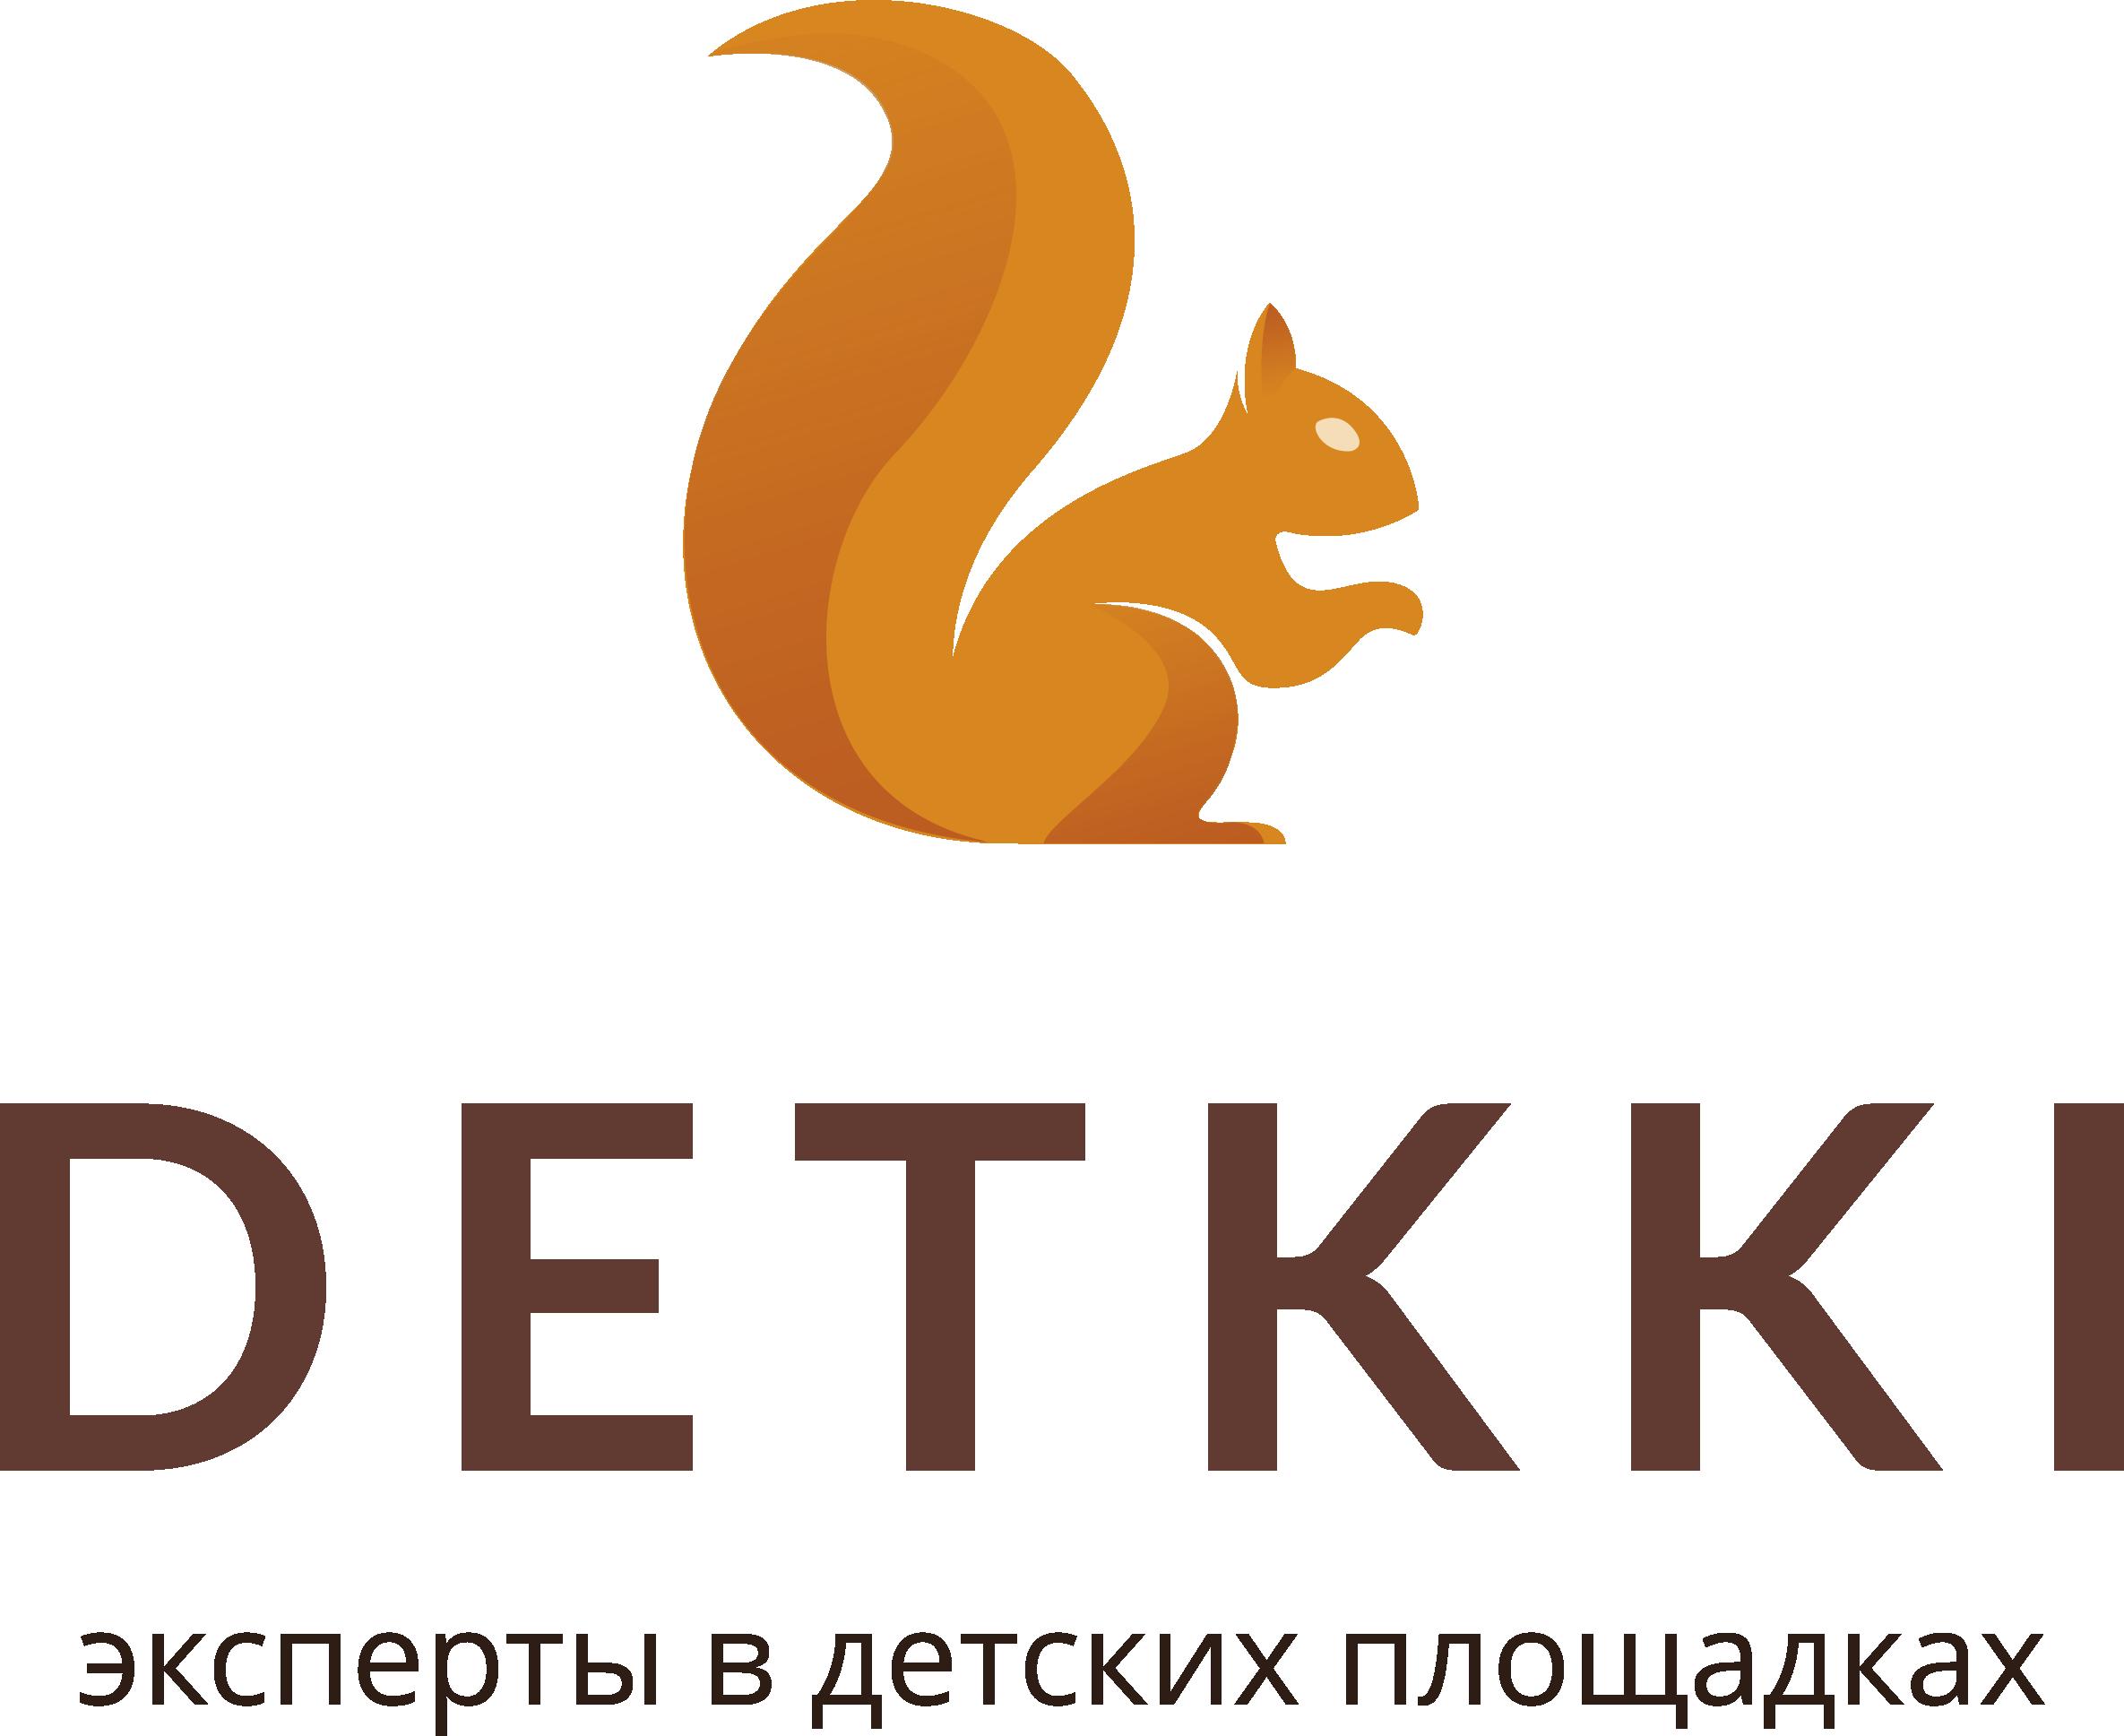 Detkki